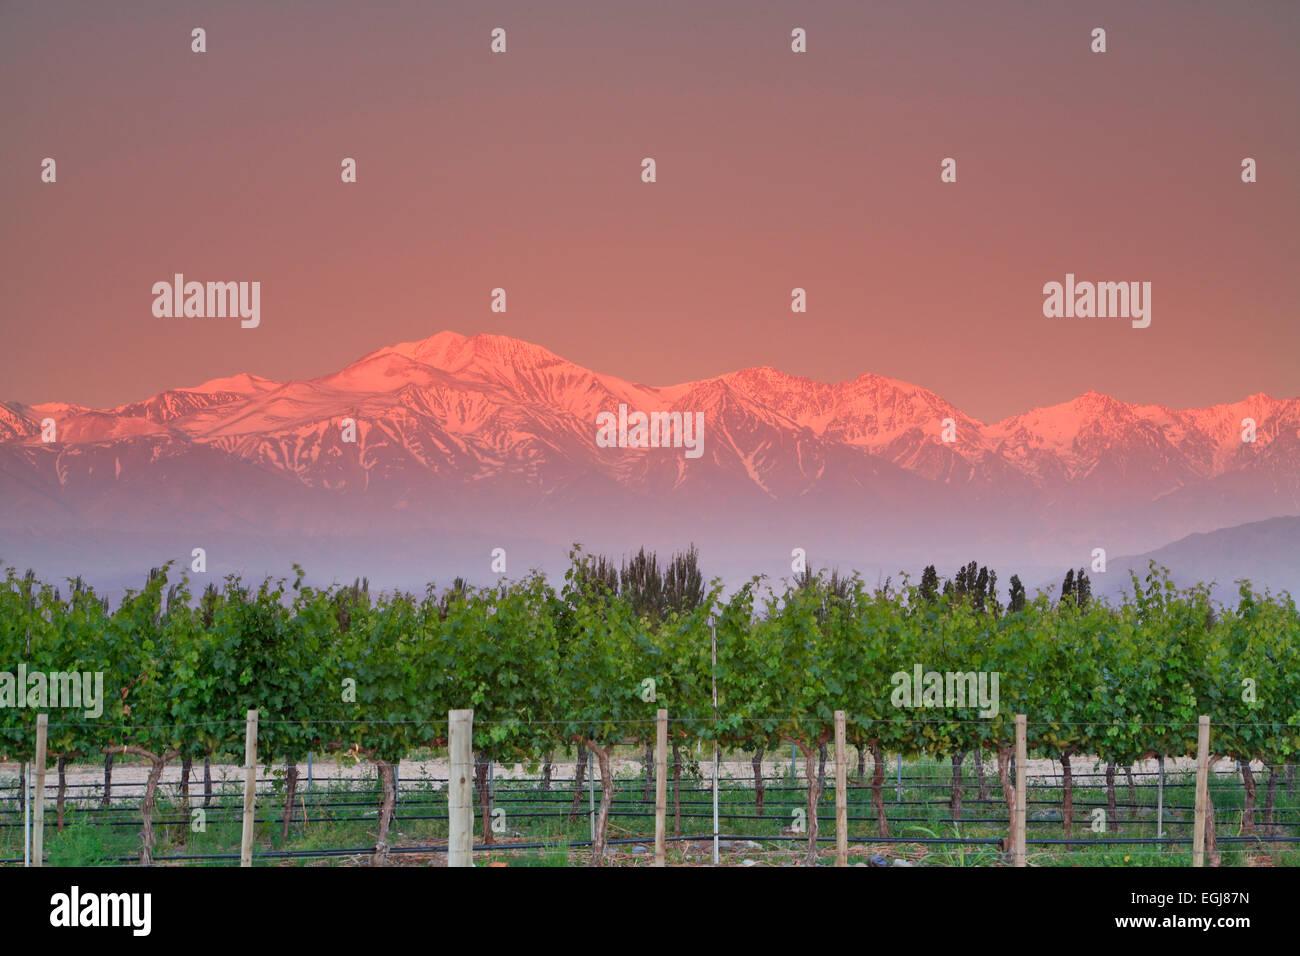 Snow-covered Plata Peak (20,341 ft.) and vineyards, near Tupungato, Mendoza Province, Argentina - Stock Image